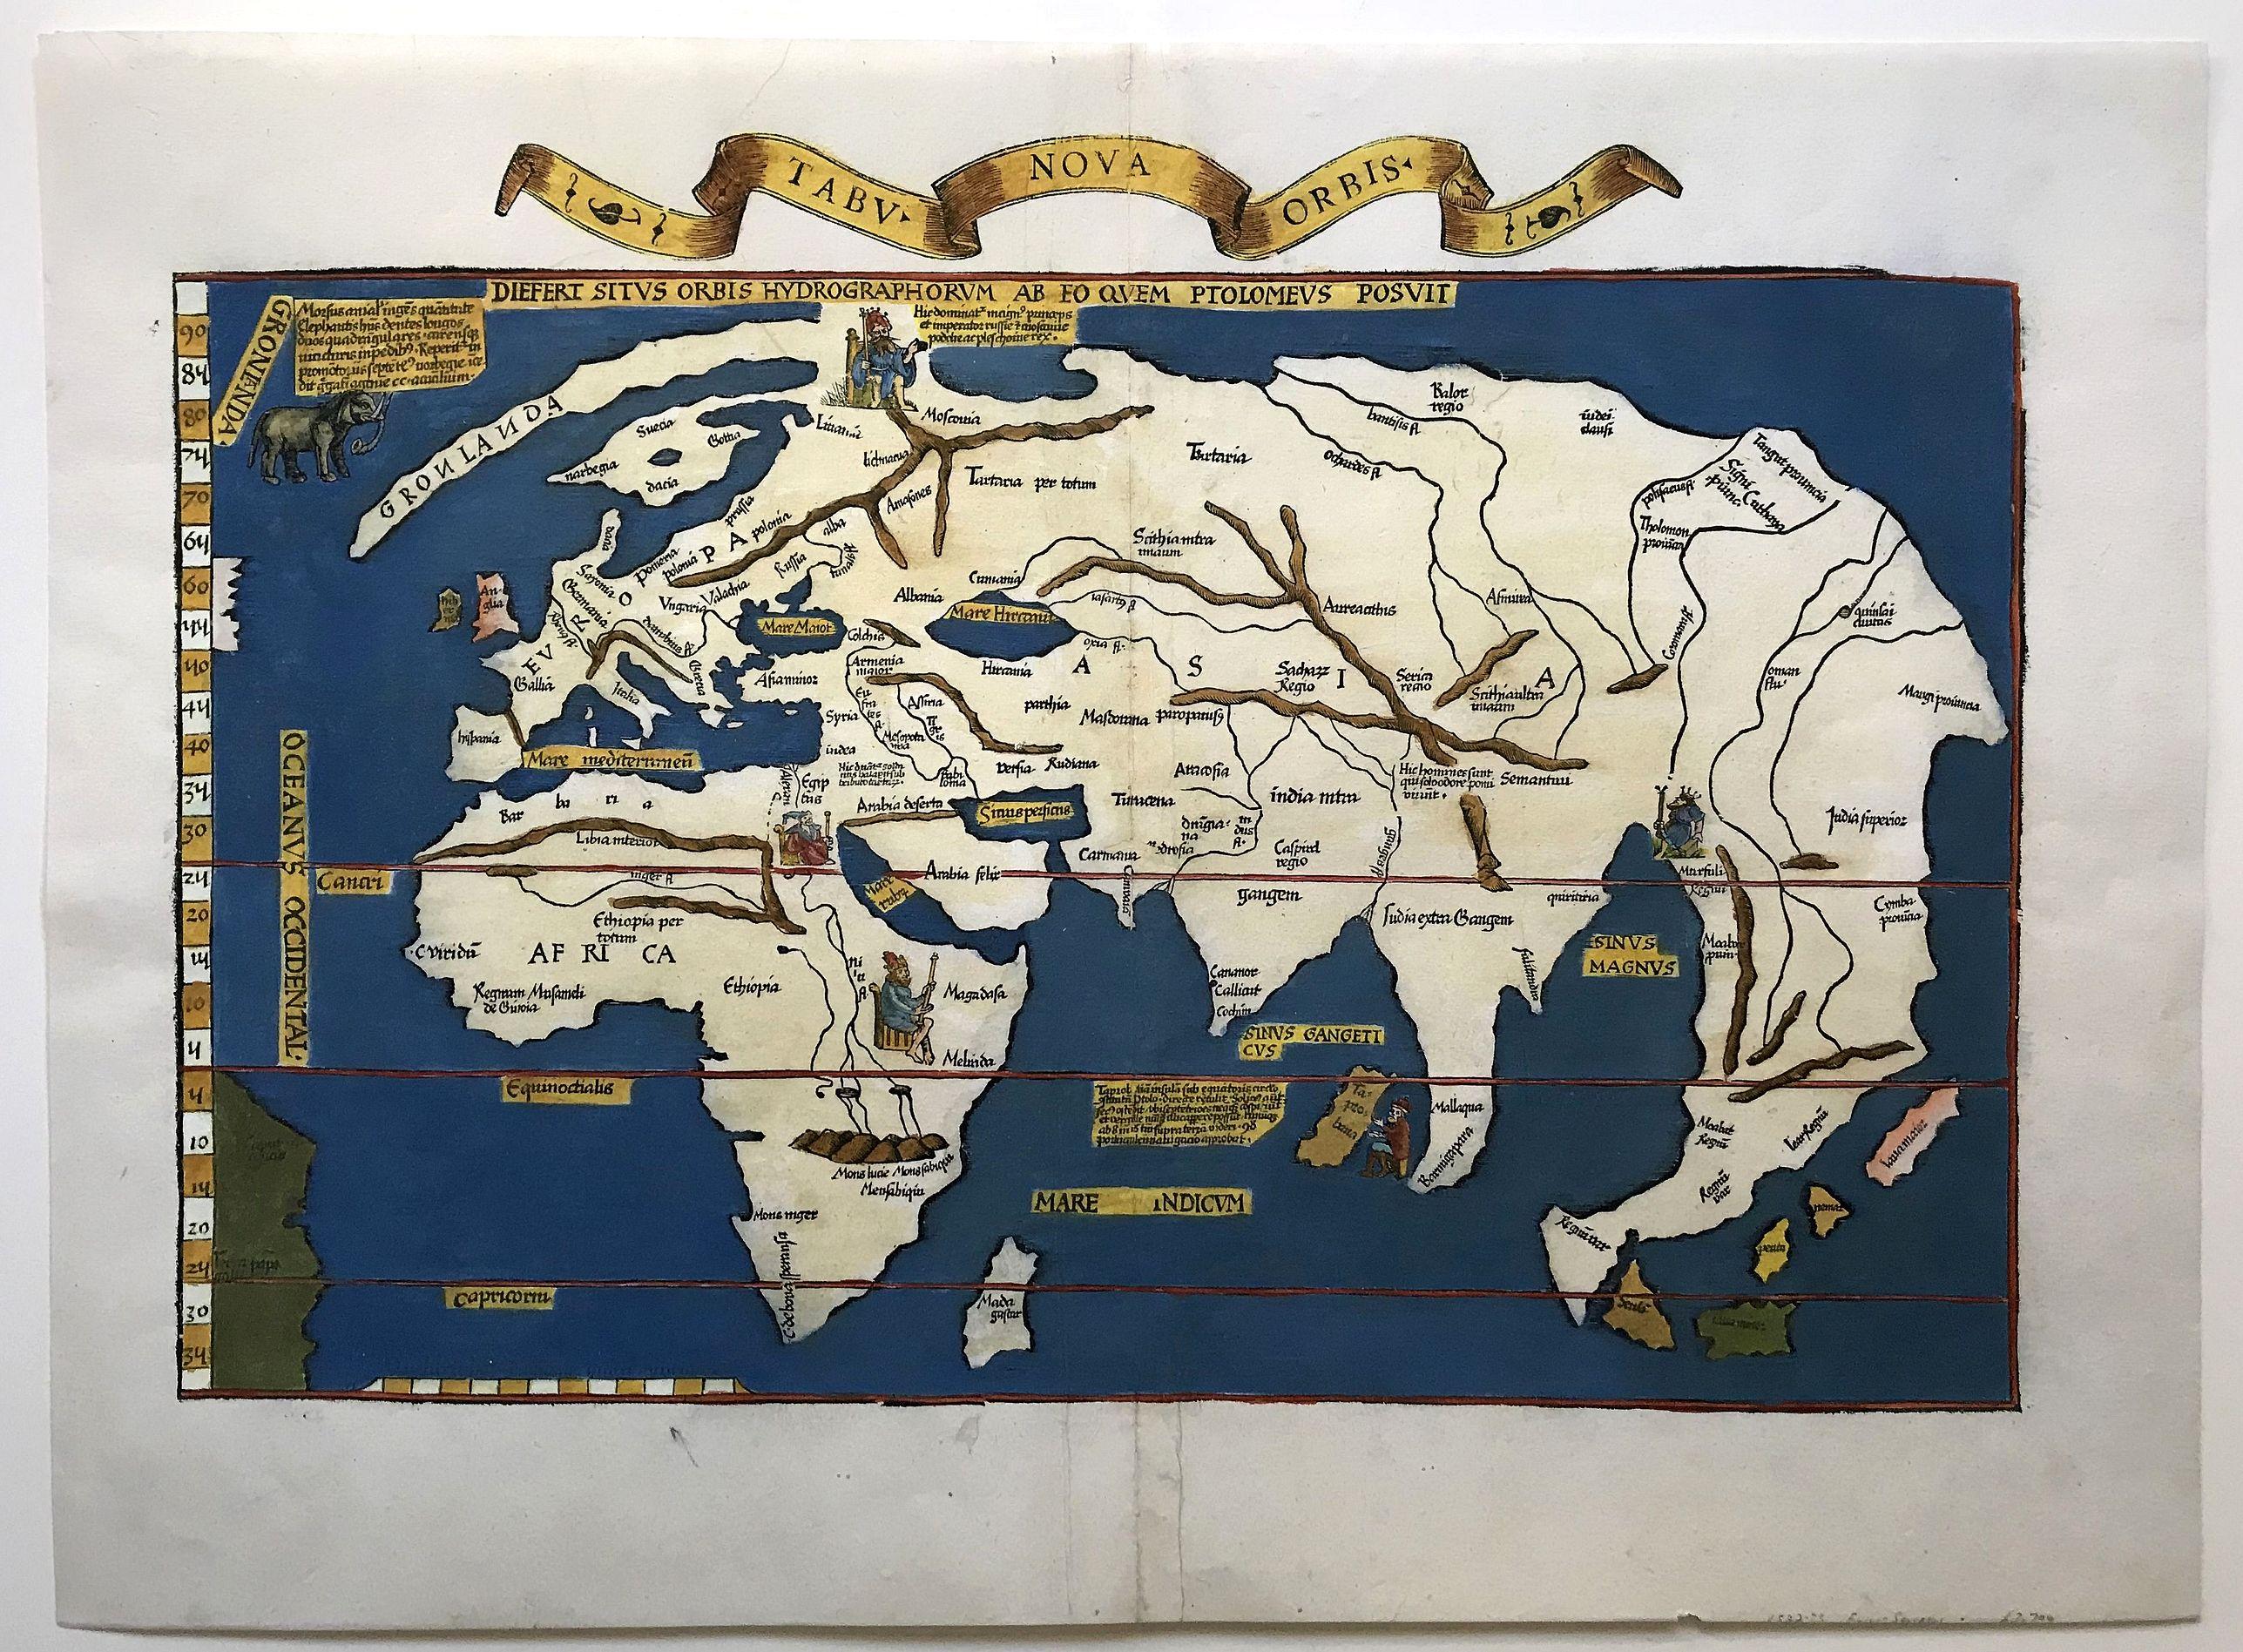 FRIES, L. - Tabu Nova Orbis / Diefert Situs Orbis Hydrographorum Ab Eo Quem Ptolomeus Posuit. . .